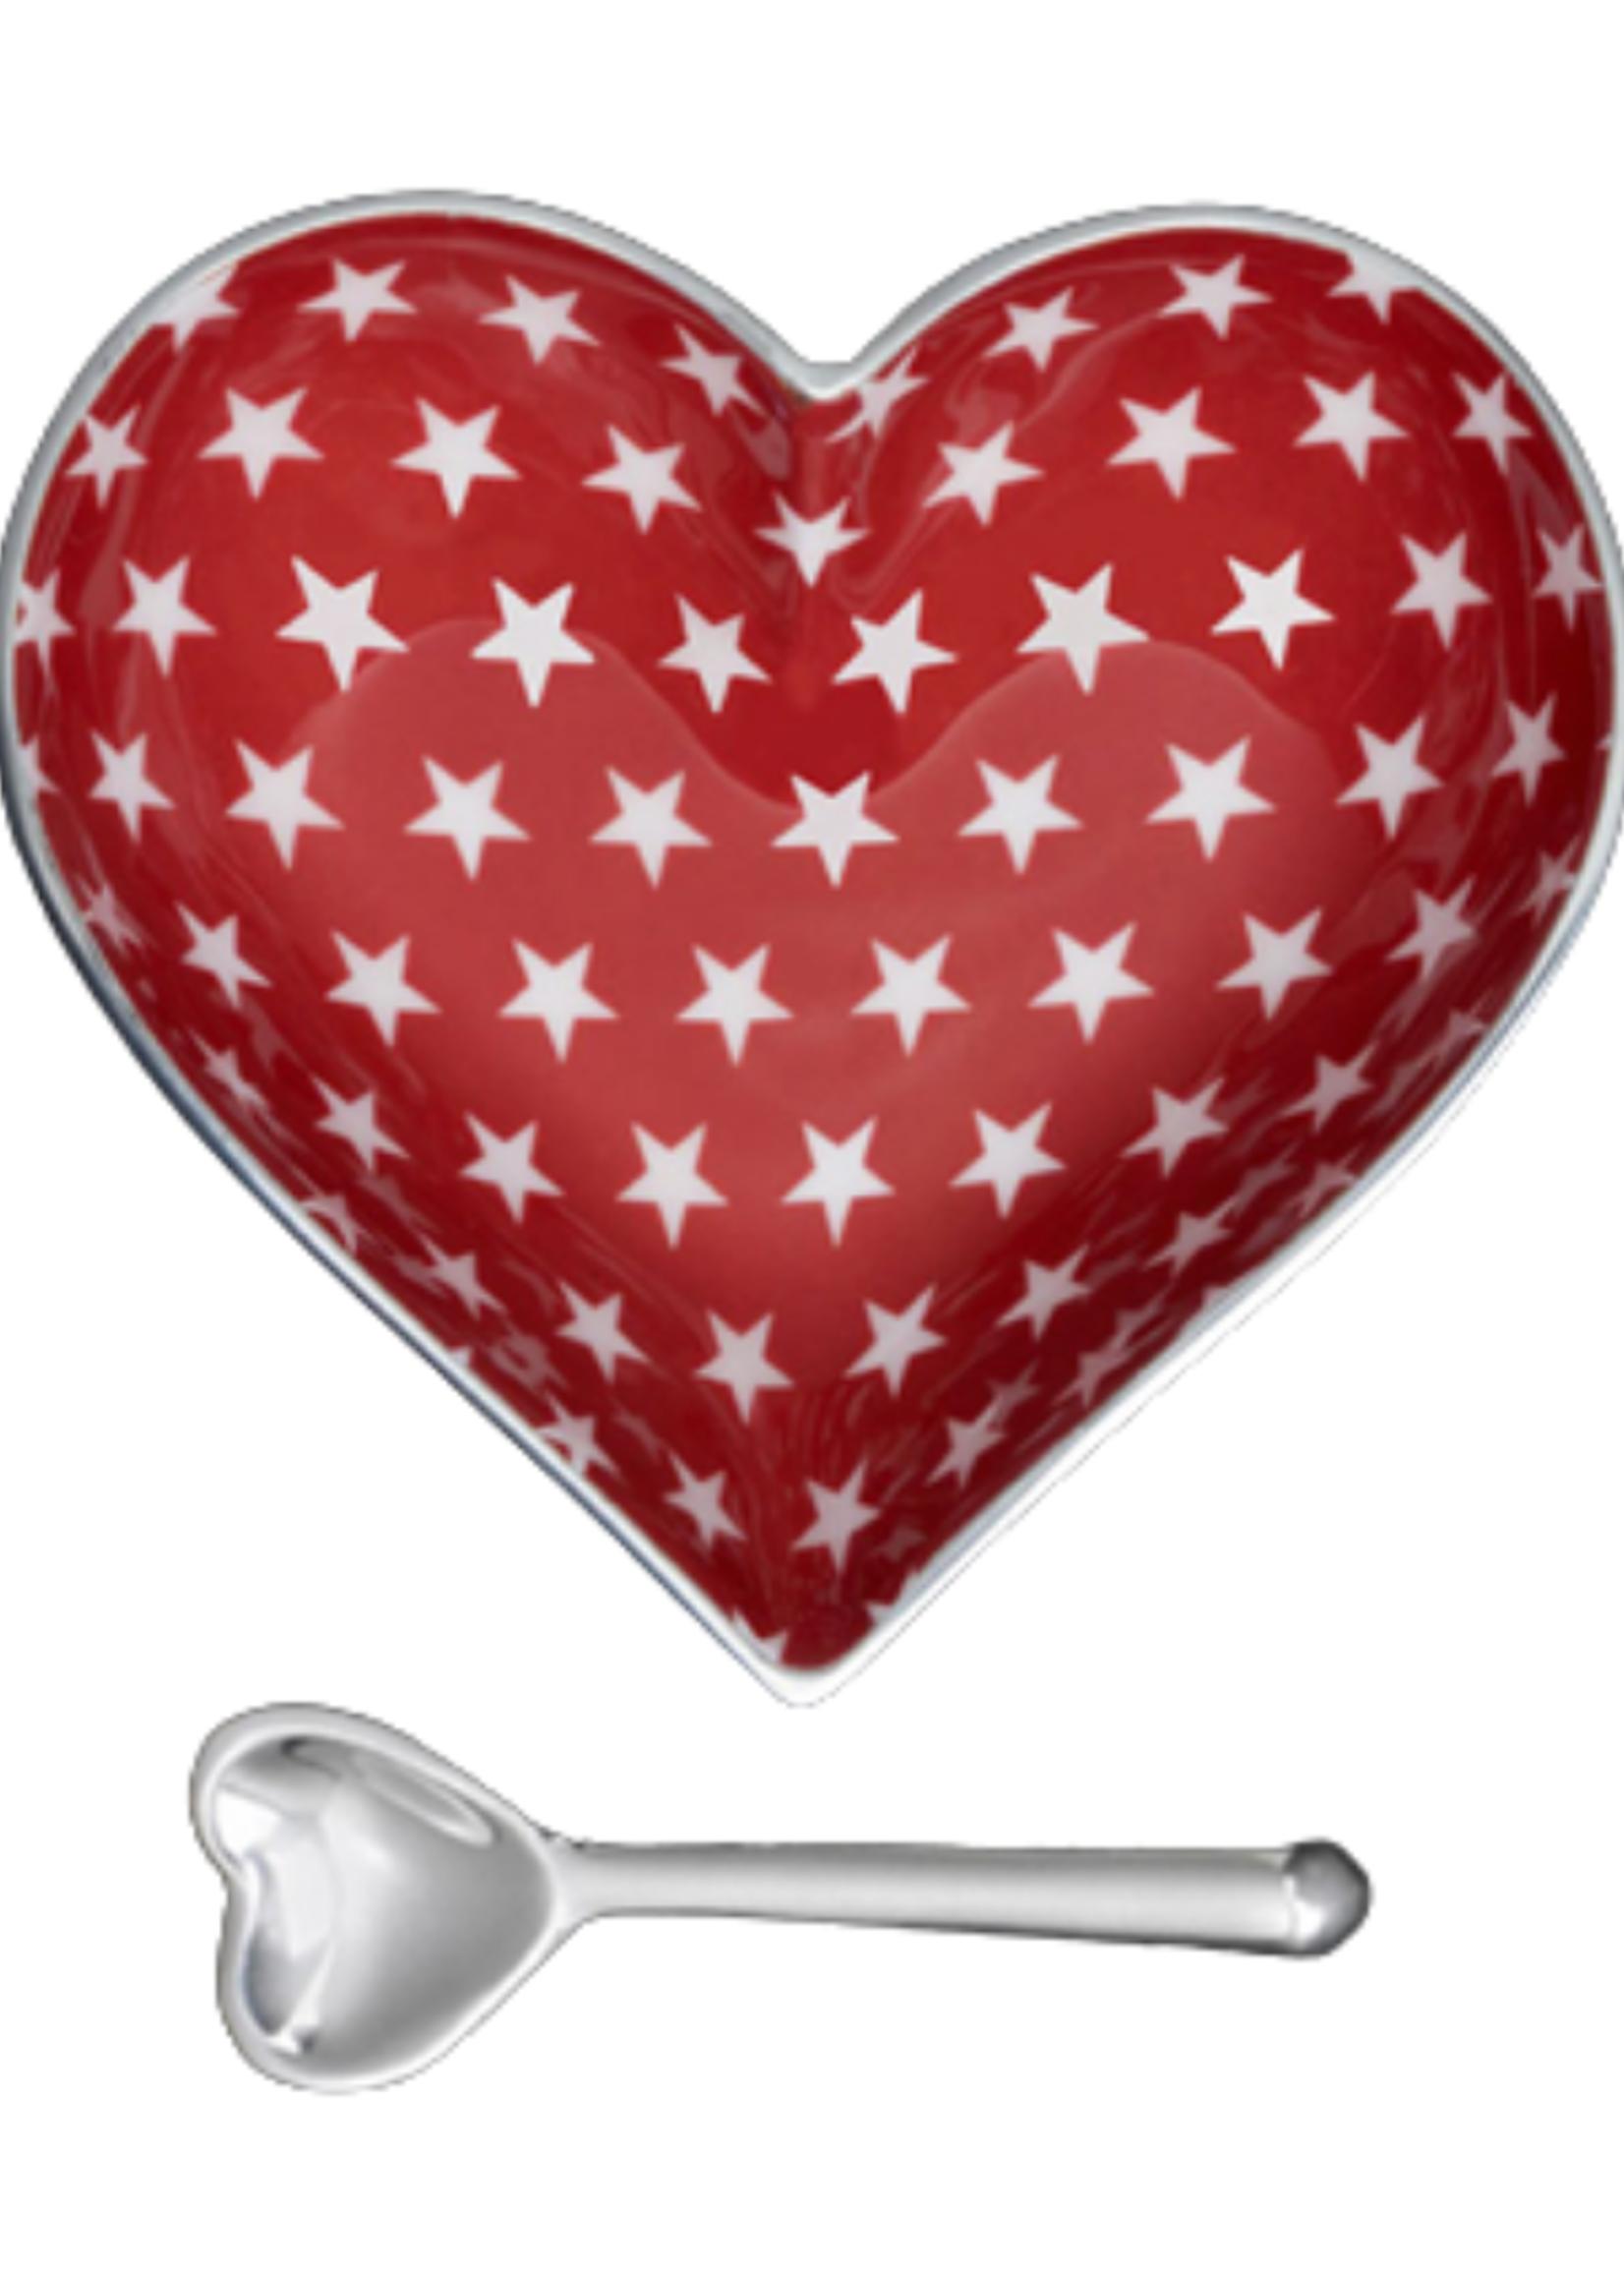 Happy Heart Bowl w Spoon // Red w White Stars